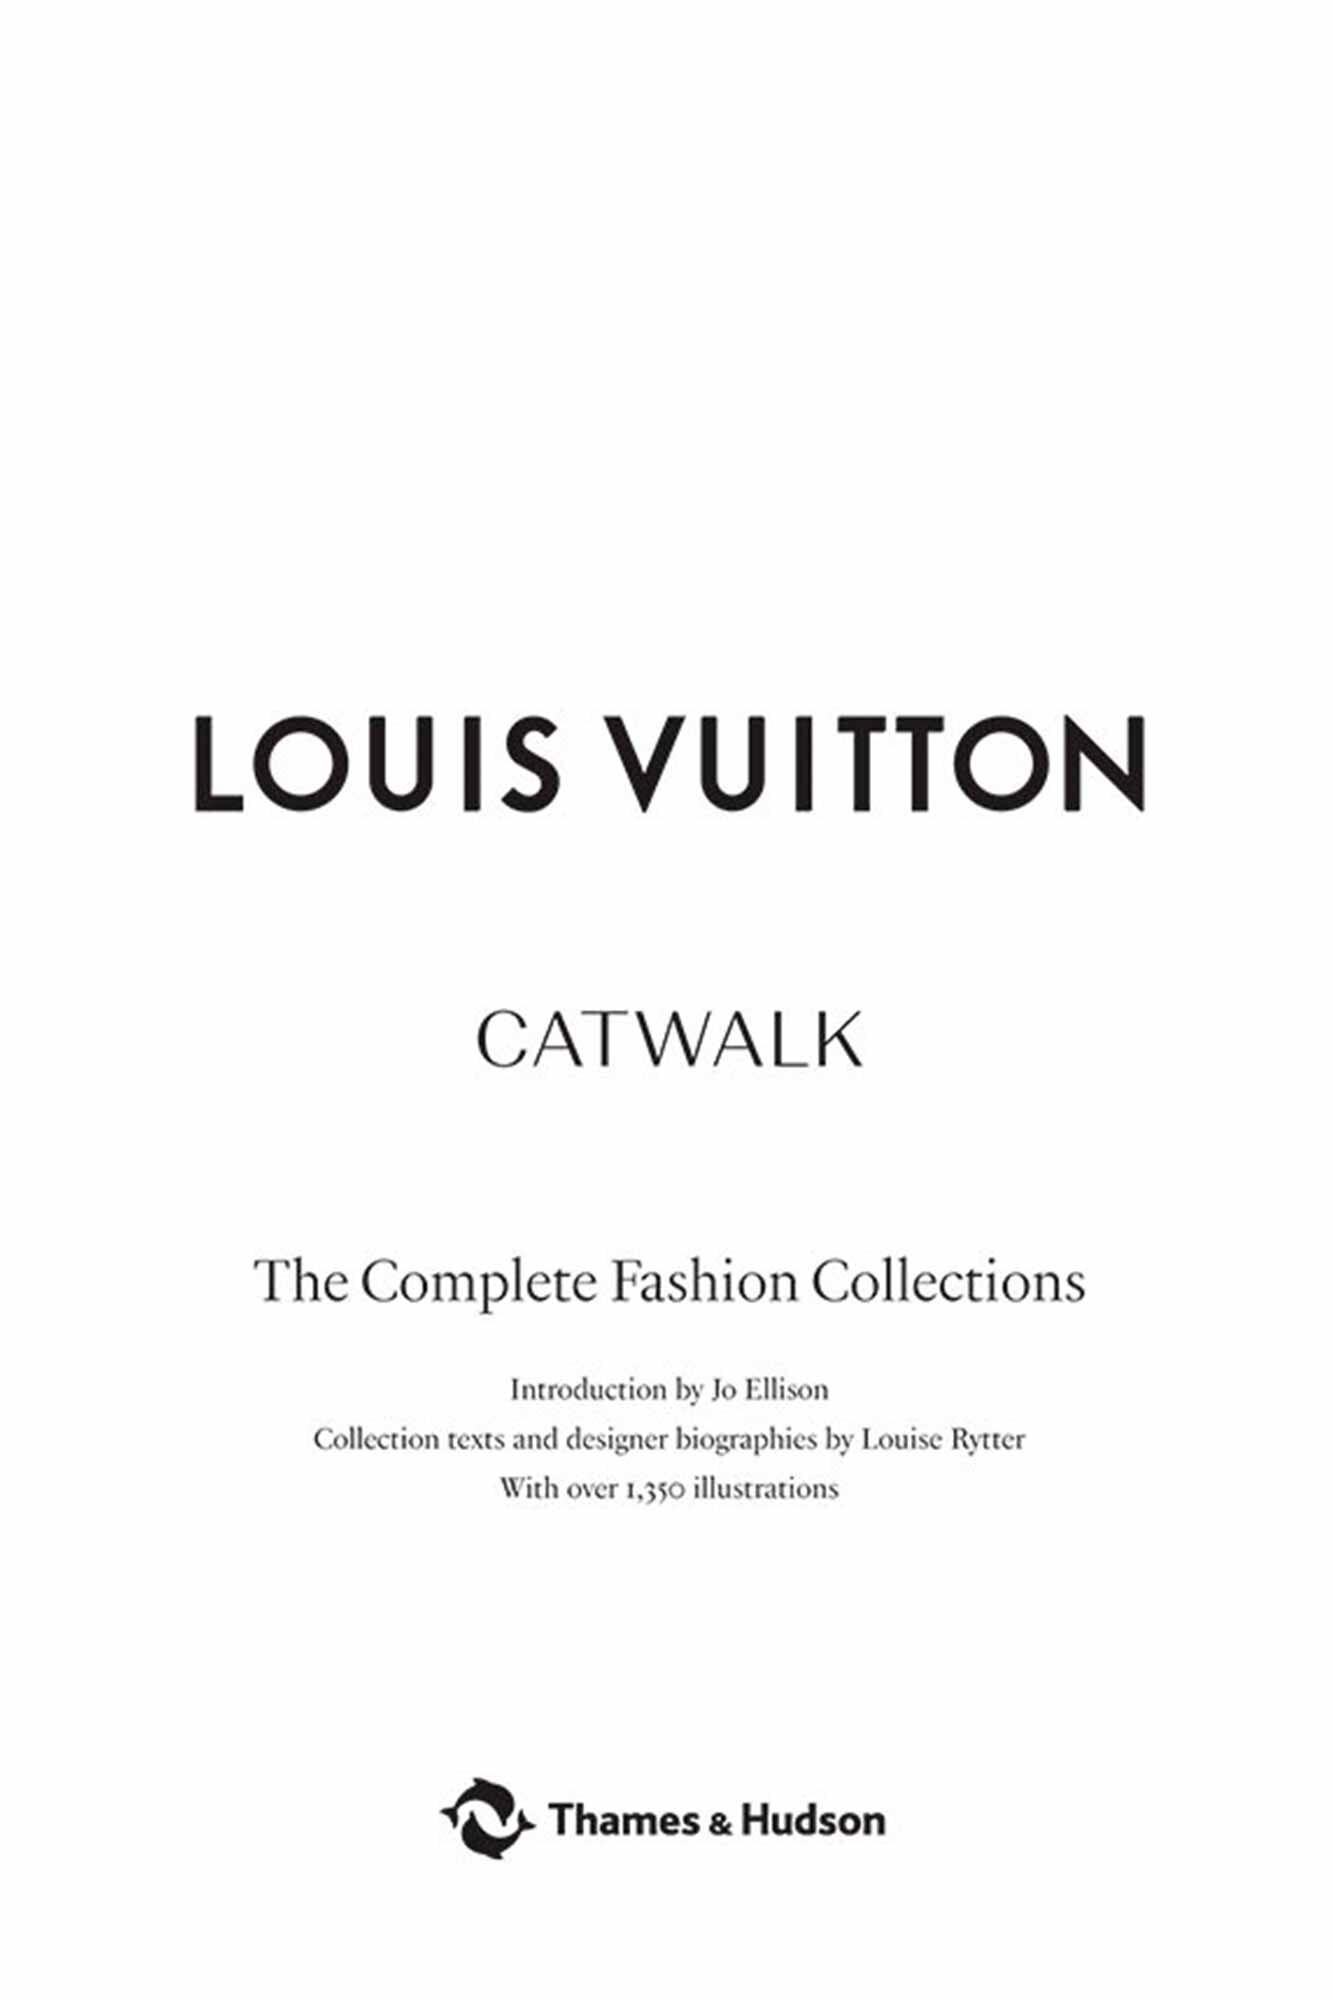 Louis vuitton catwalk TH1018